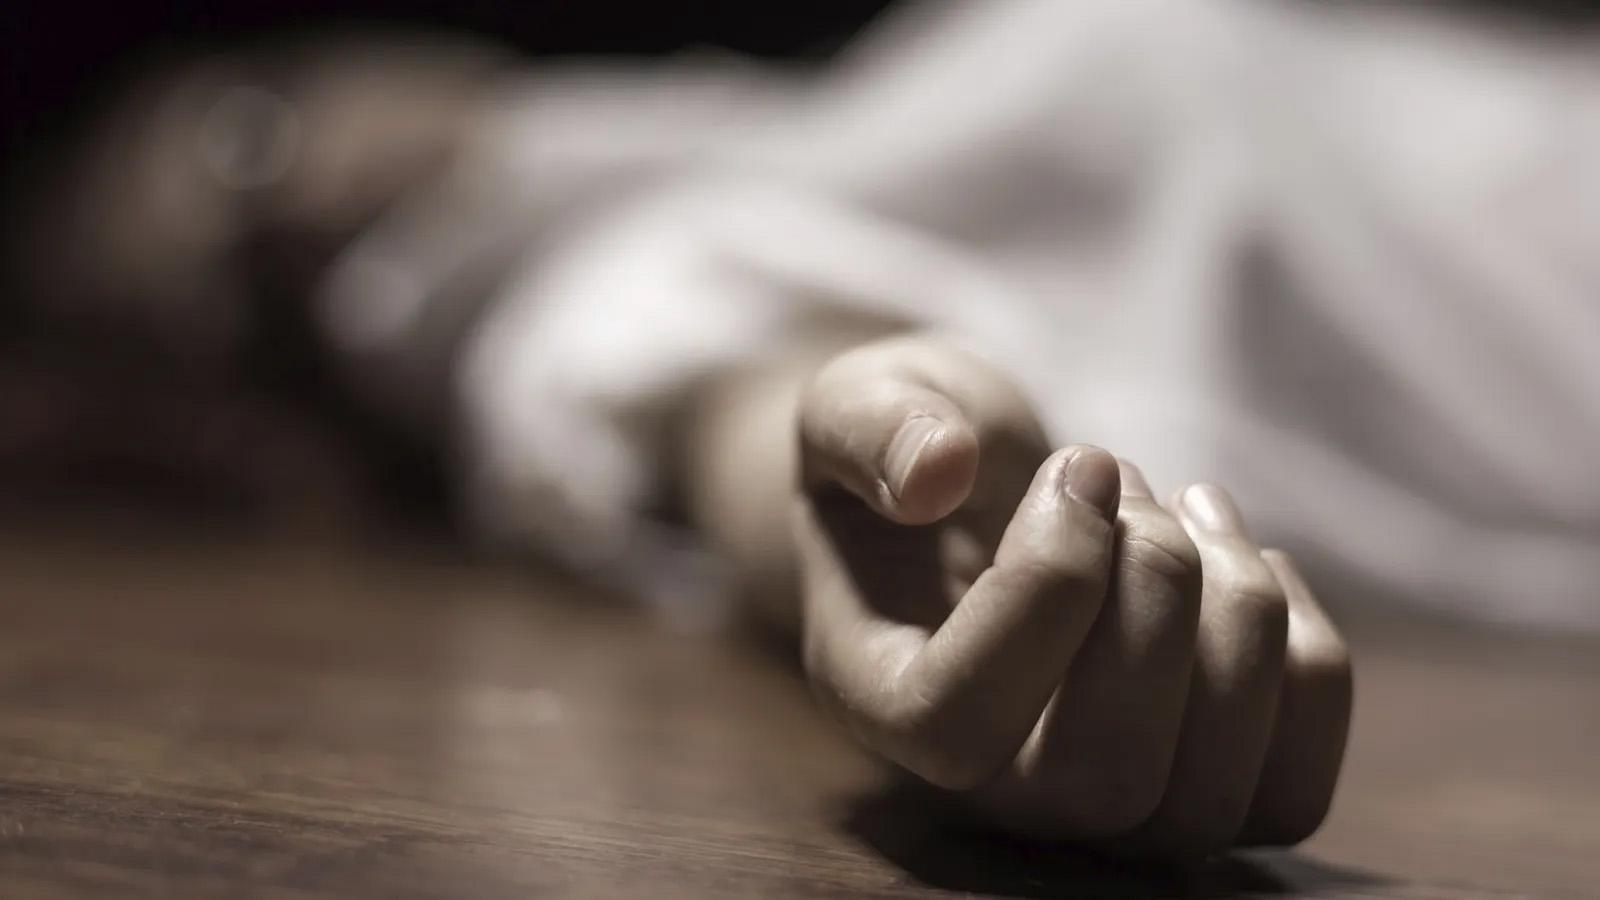 चार दिनदेखि सम्पर्कविहीन किशोरी मृत फेला